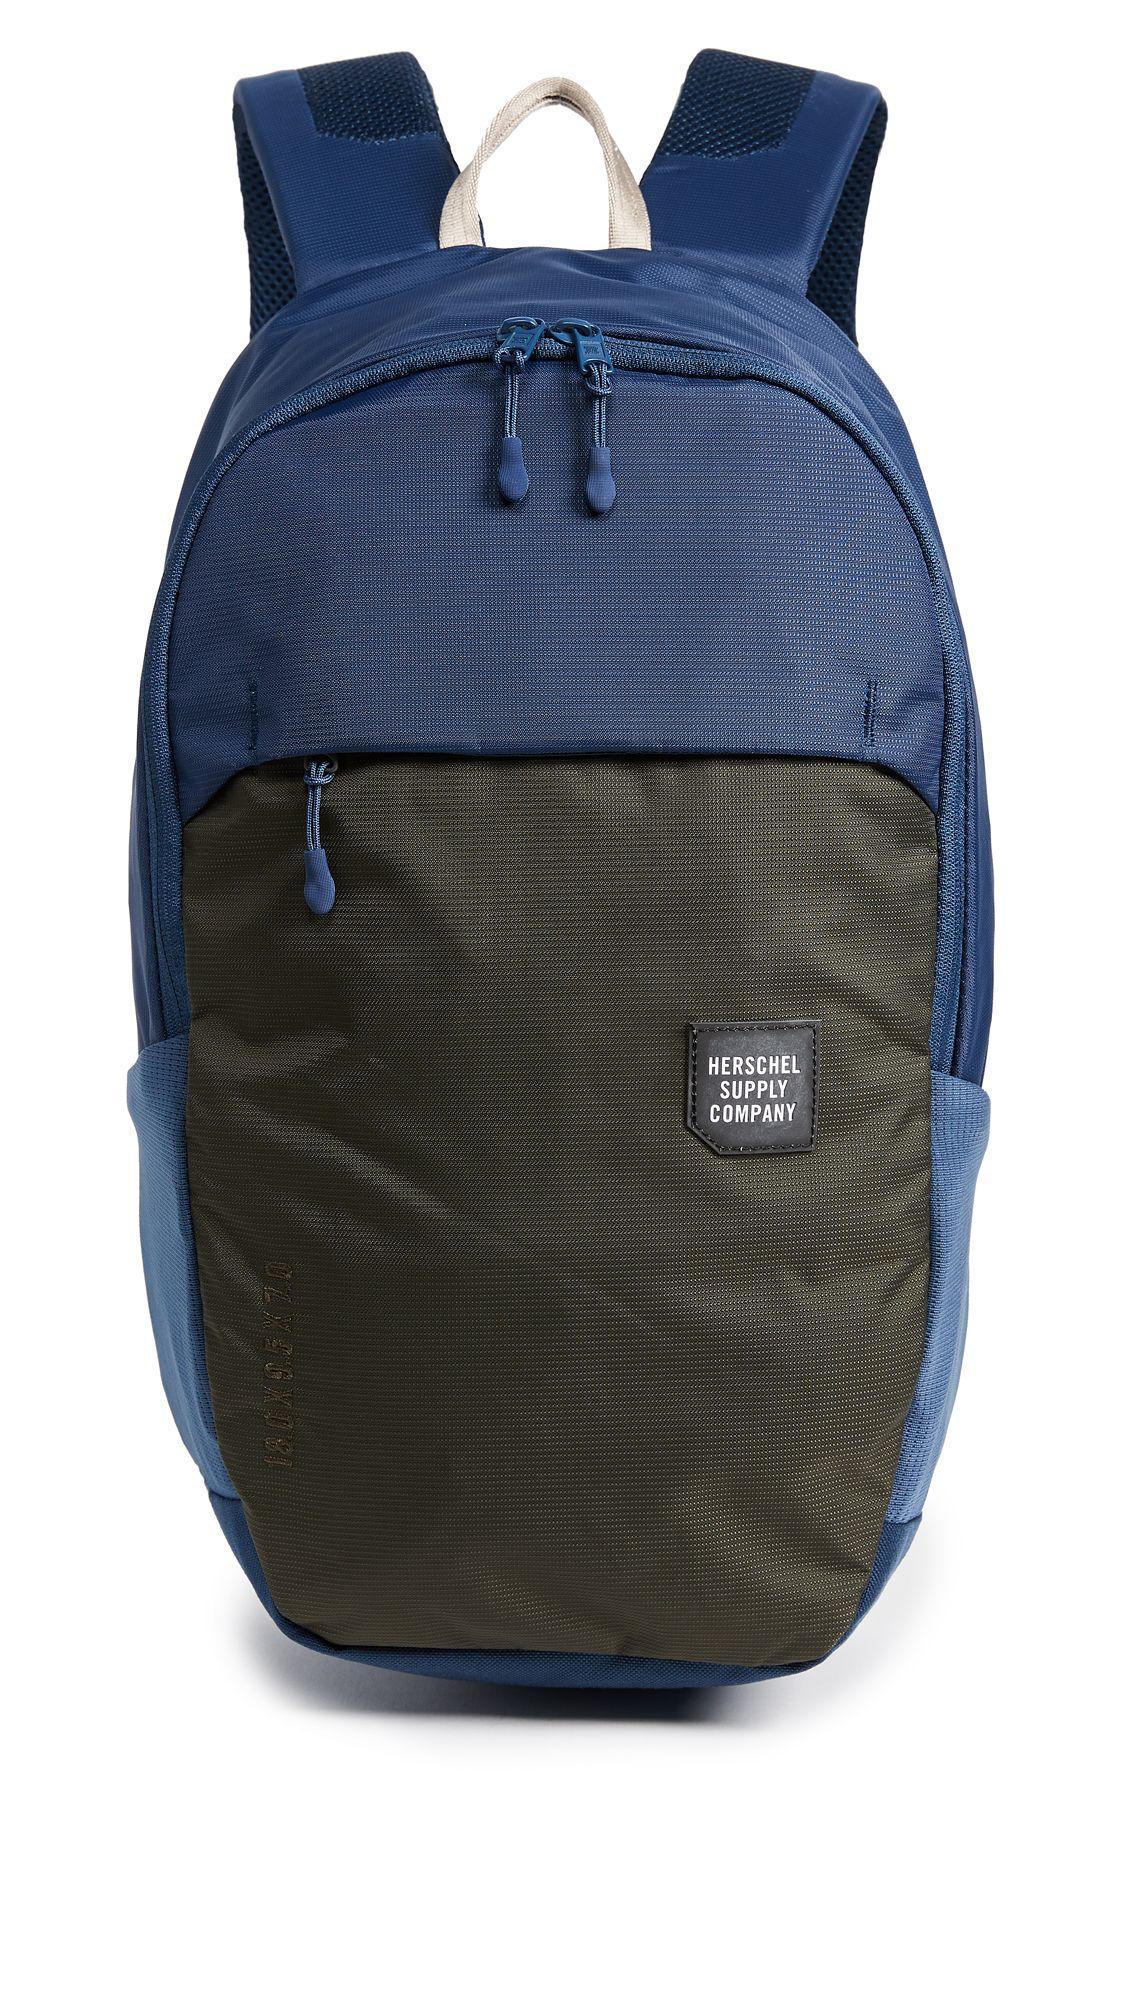 8e51209f38a HERSCHEL SUPPLY CO. MAMMOTH MEDIUM BACKPACK.  herschelsupplyco.  bags   nylon  backpacks